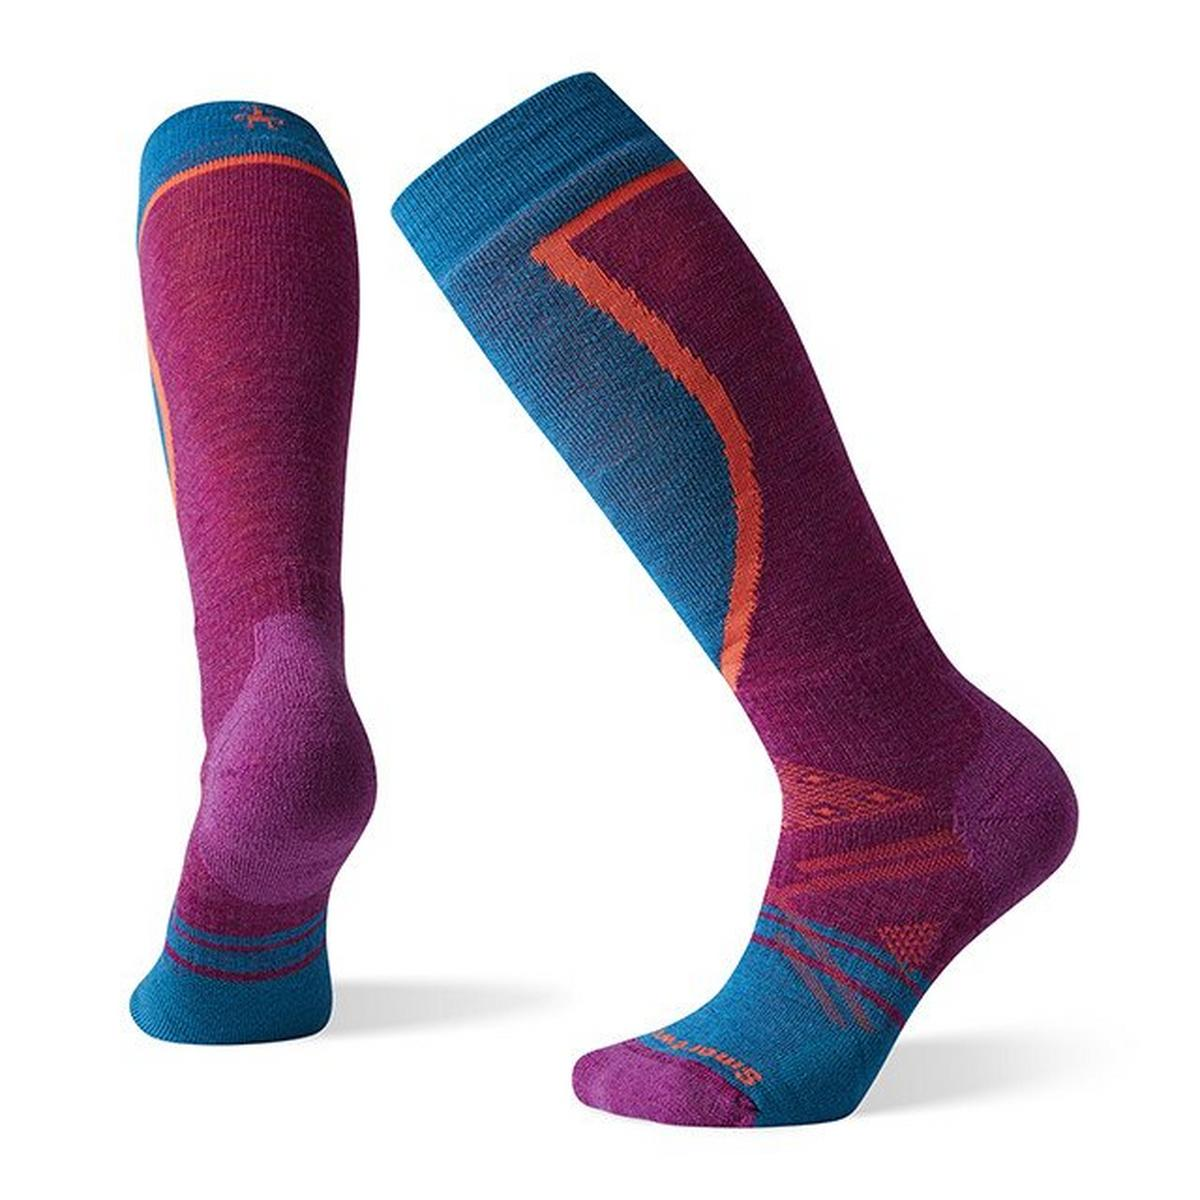 Smartwool Women's PhD Ski Medium Socks - Meadow Mauve